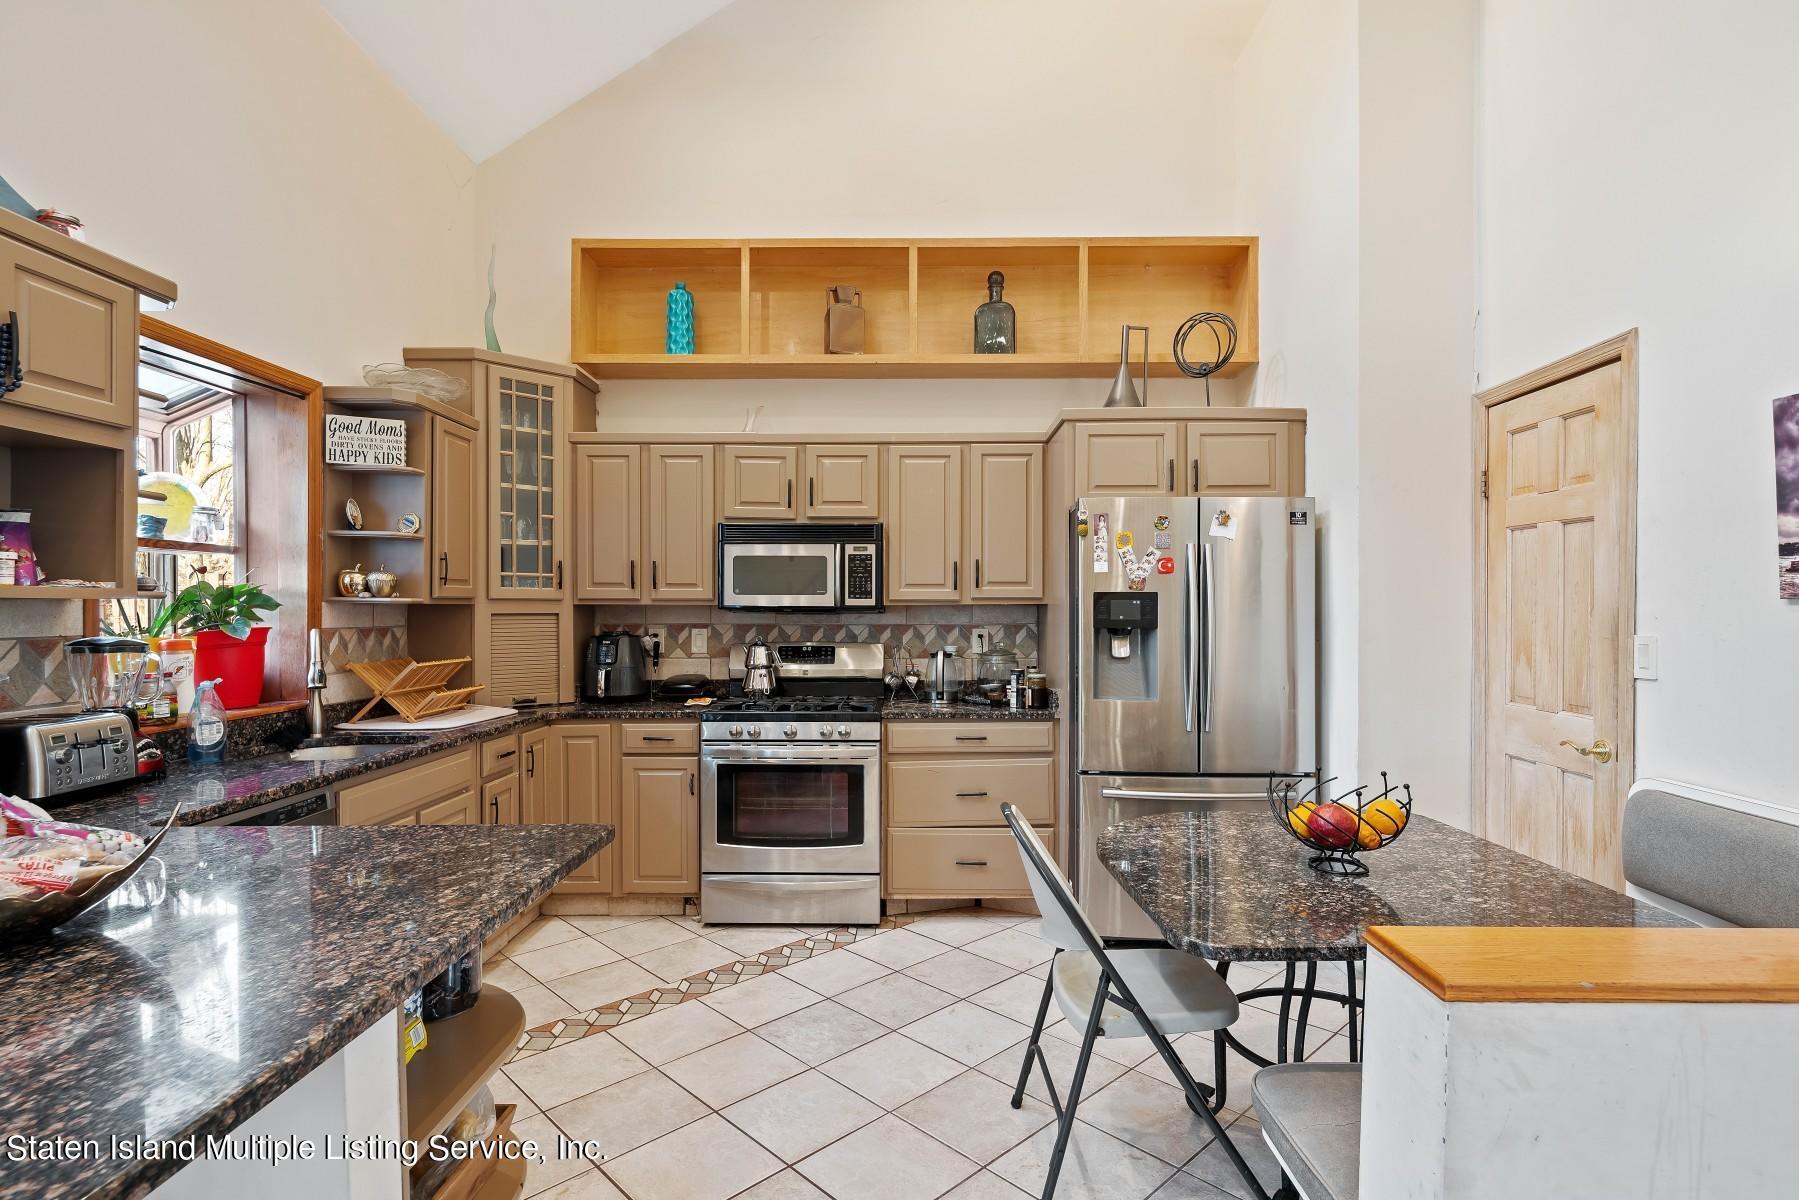 Single Family - Detached 8 Bionia Avenue  Staten Island, NY 10305, MLS-1142818-9